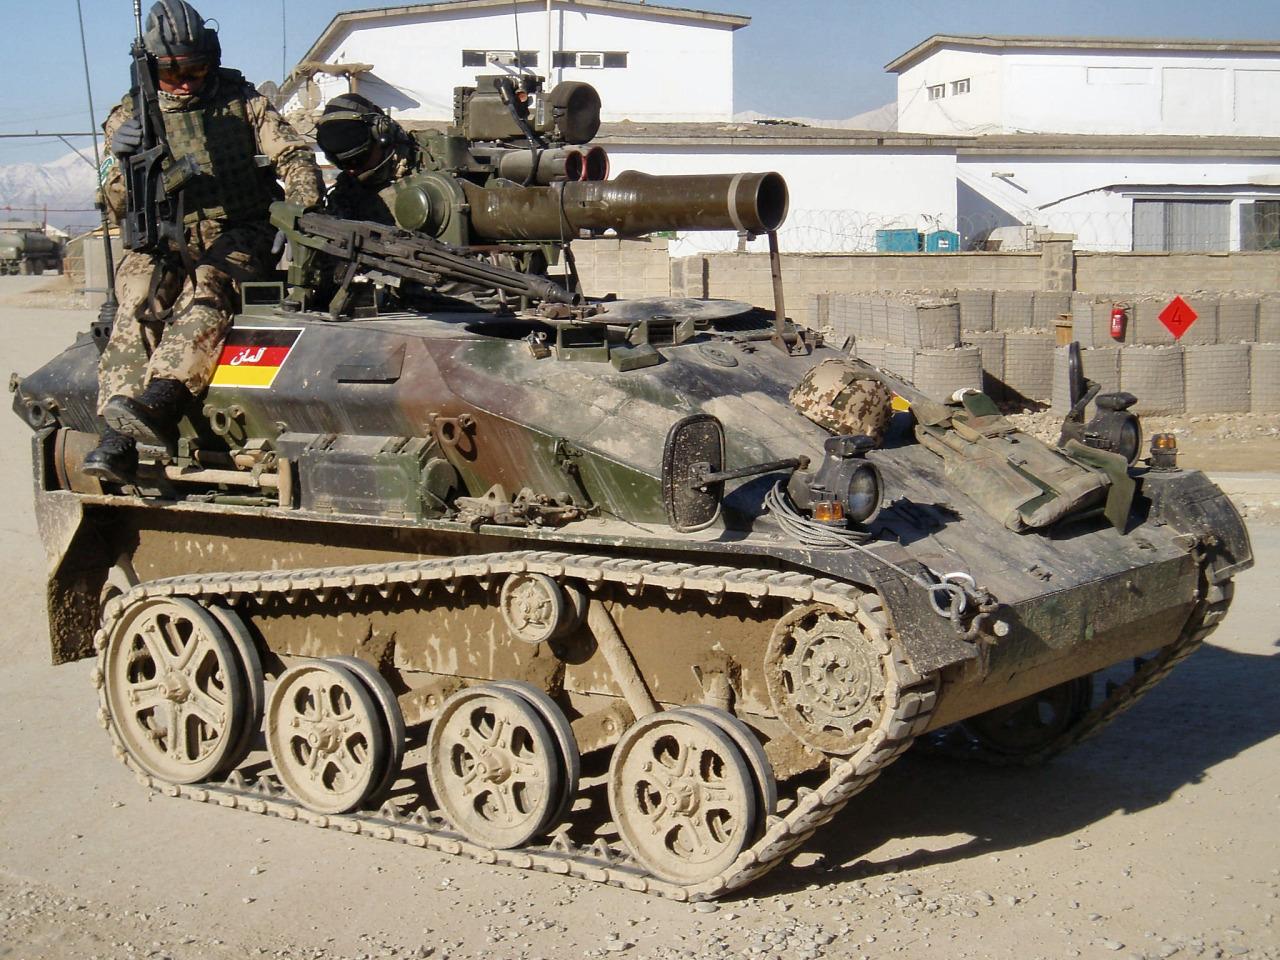 Armored Vehicles For Sale >> german Rheinmetall AG Wiesel armored weapons carrier isaf 3 | laststandonzombieisland